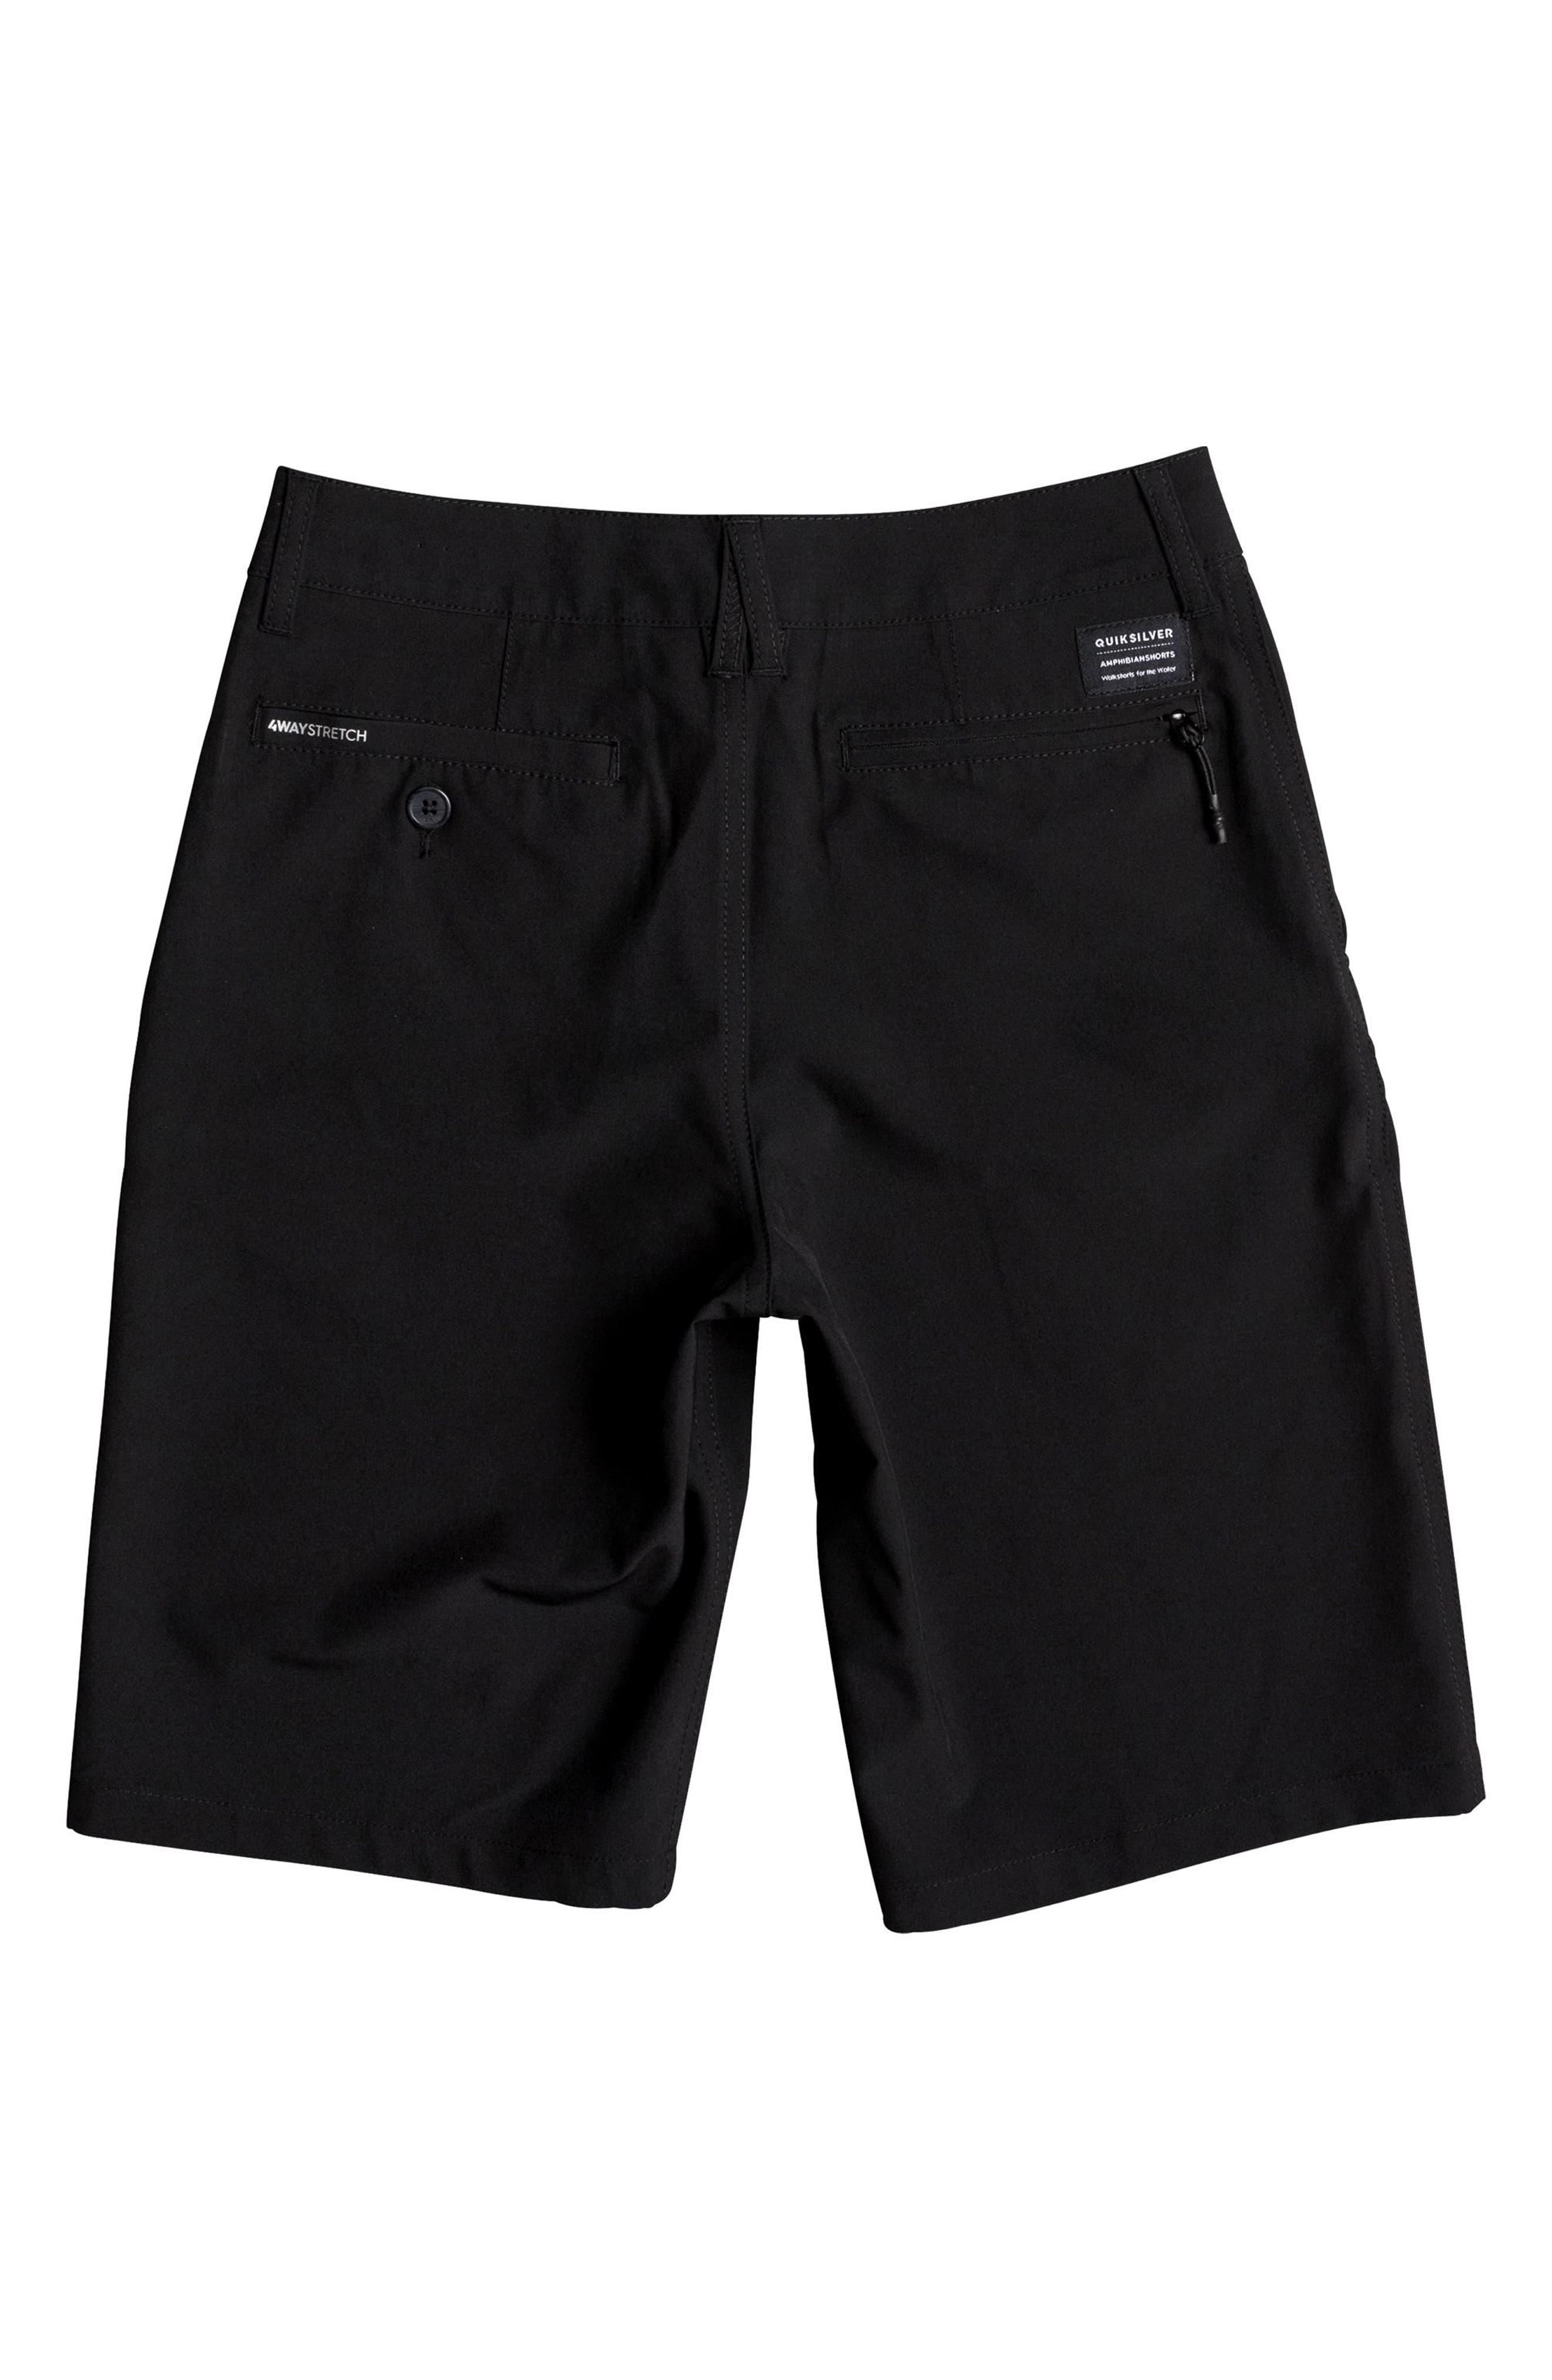 Union Amphibian Hybrid Shorts,                             Alternate thumbnail 2, color,                             002